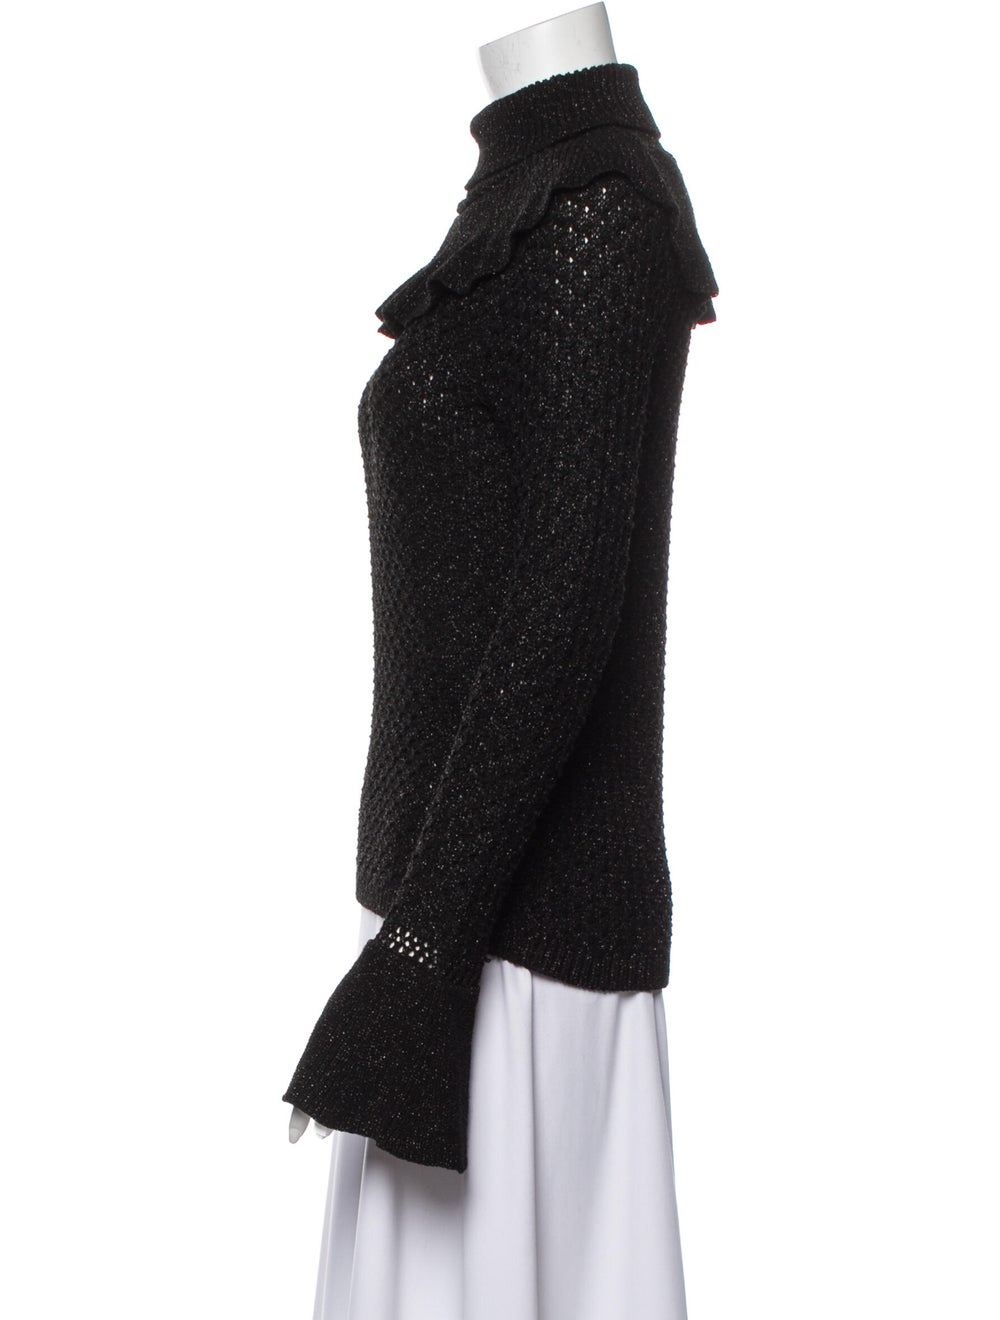 Co. Turtleneck Sweater Black - image 2